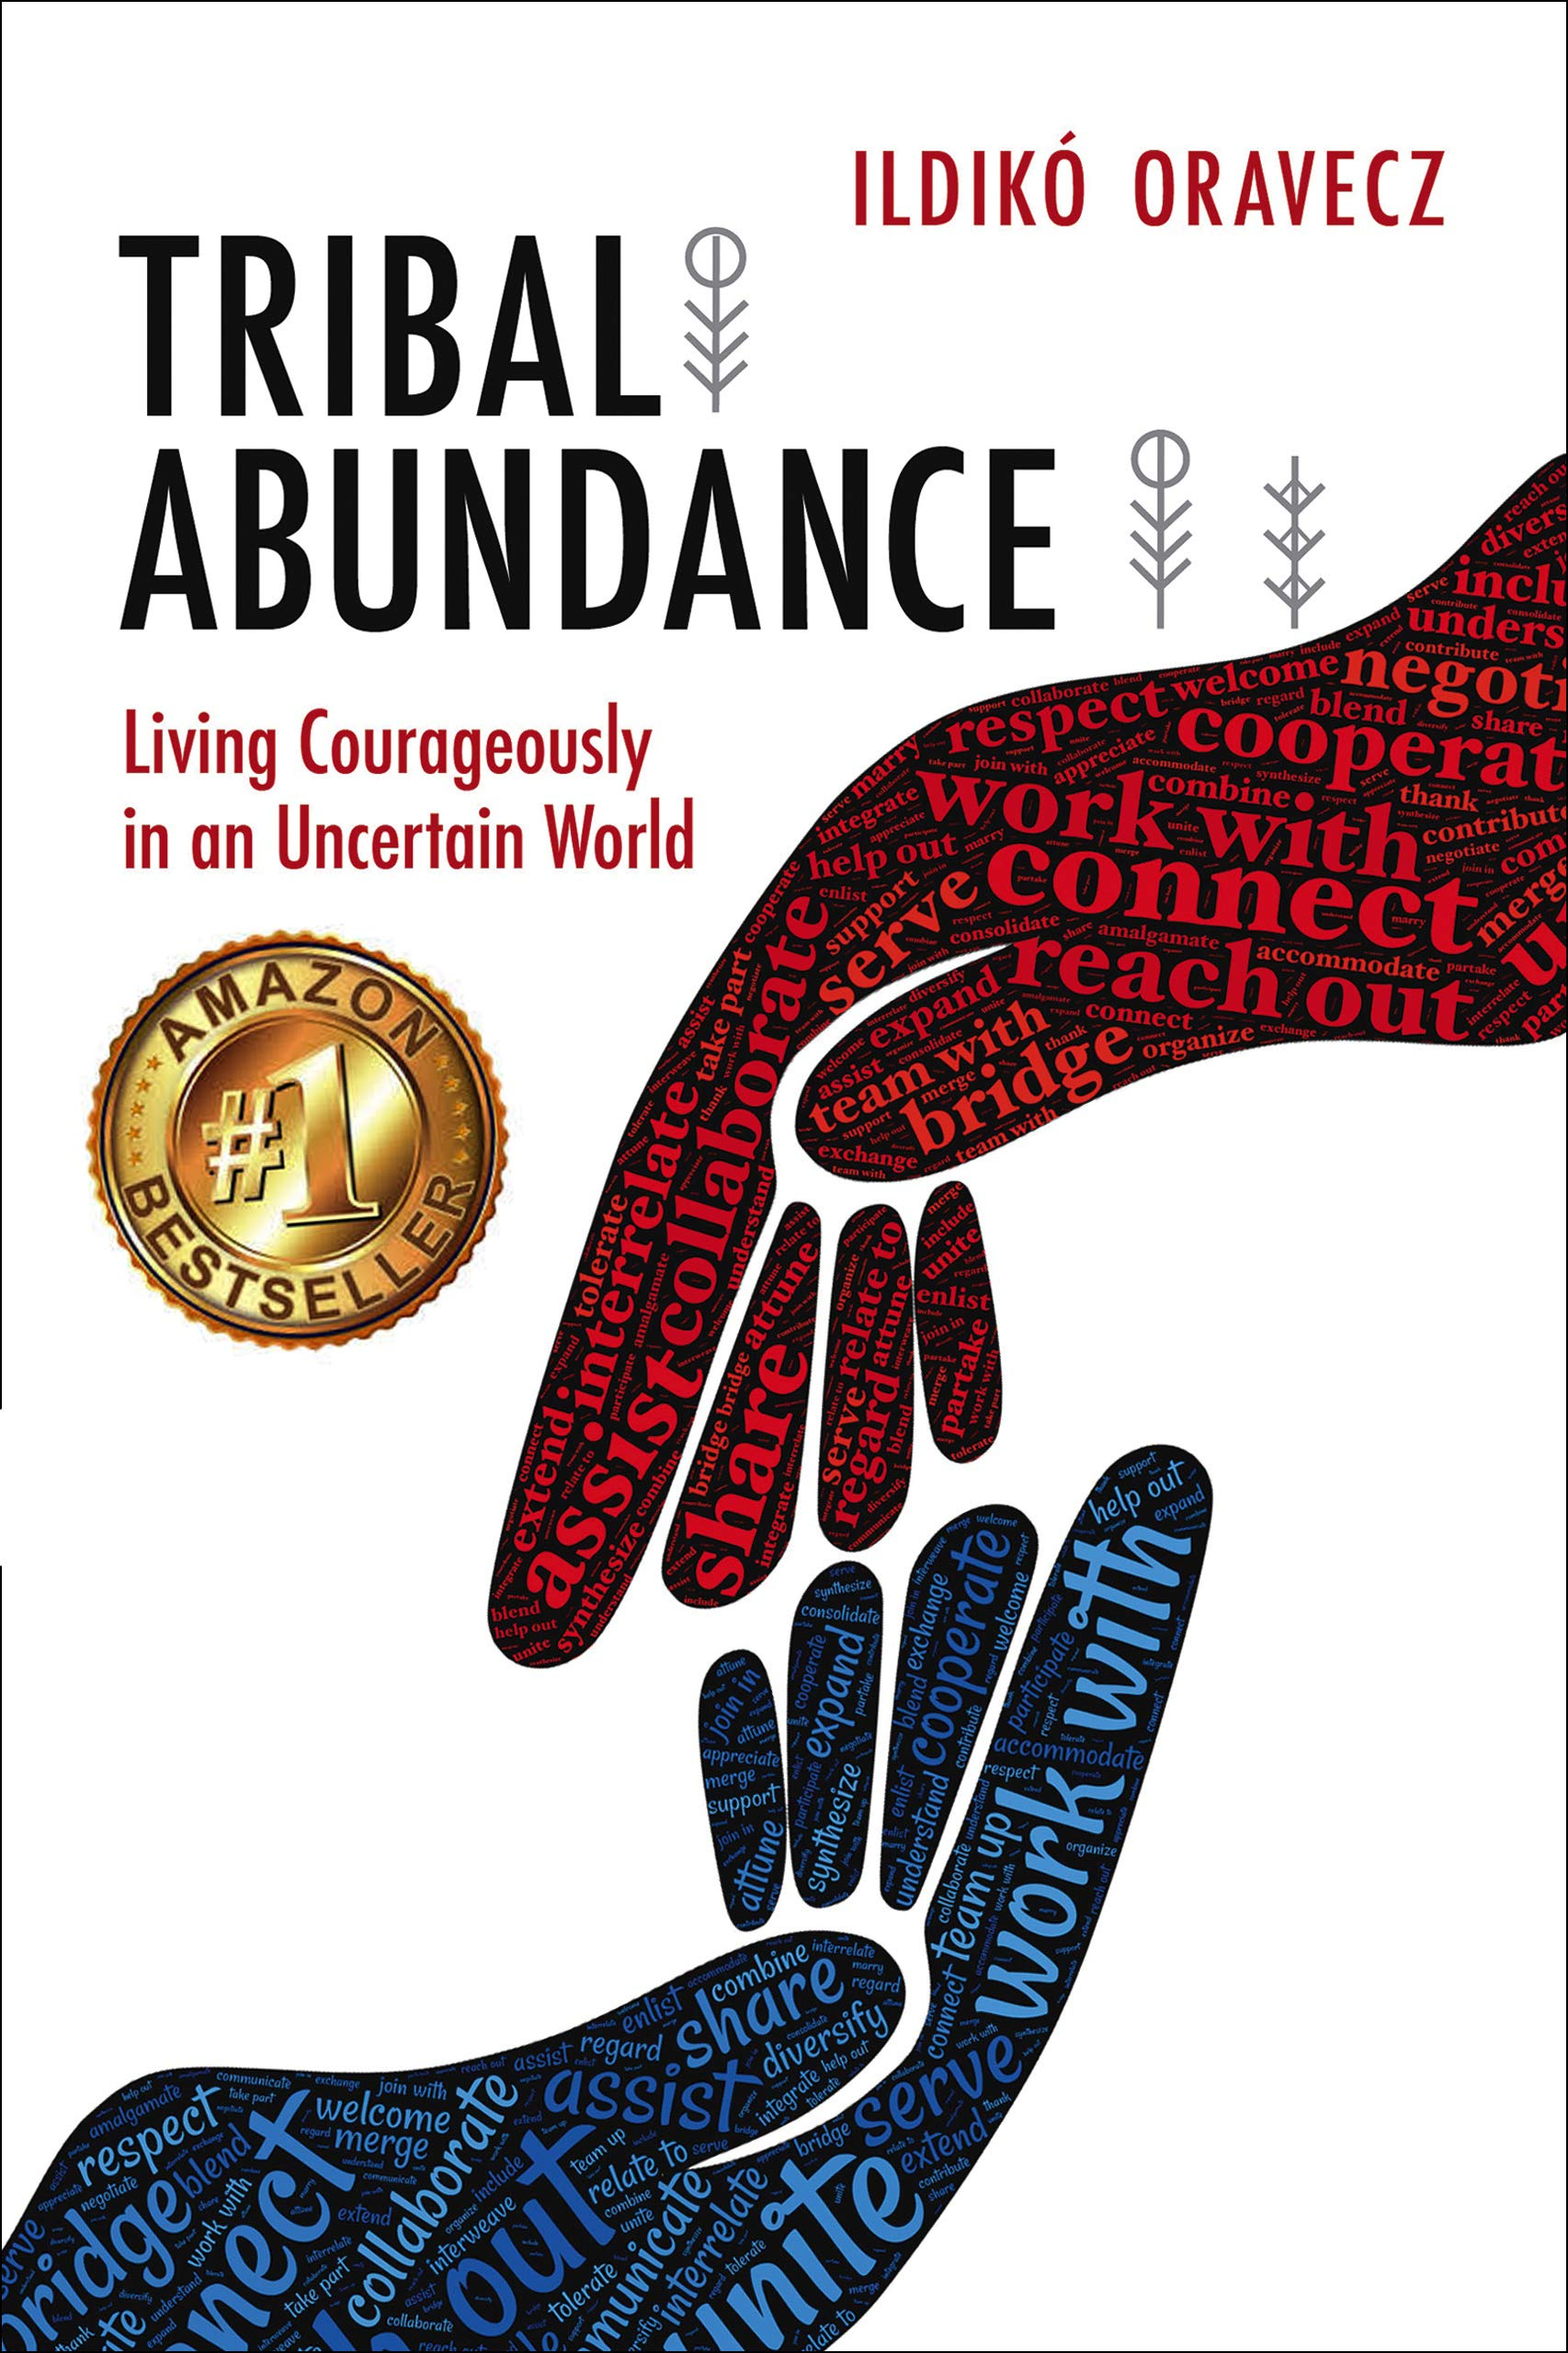 Tribal Abundance: Living Courageously in an Uncertain World